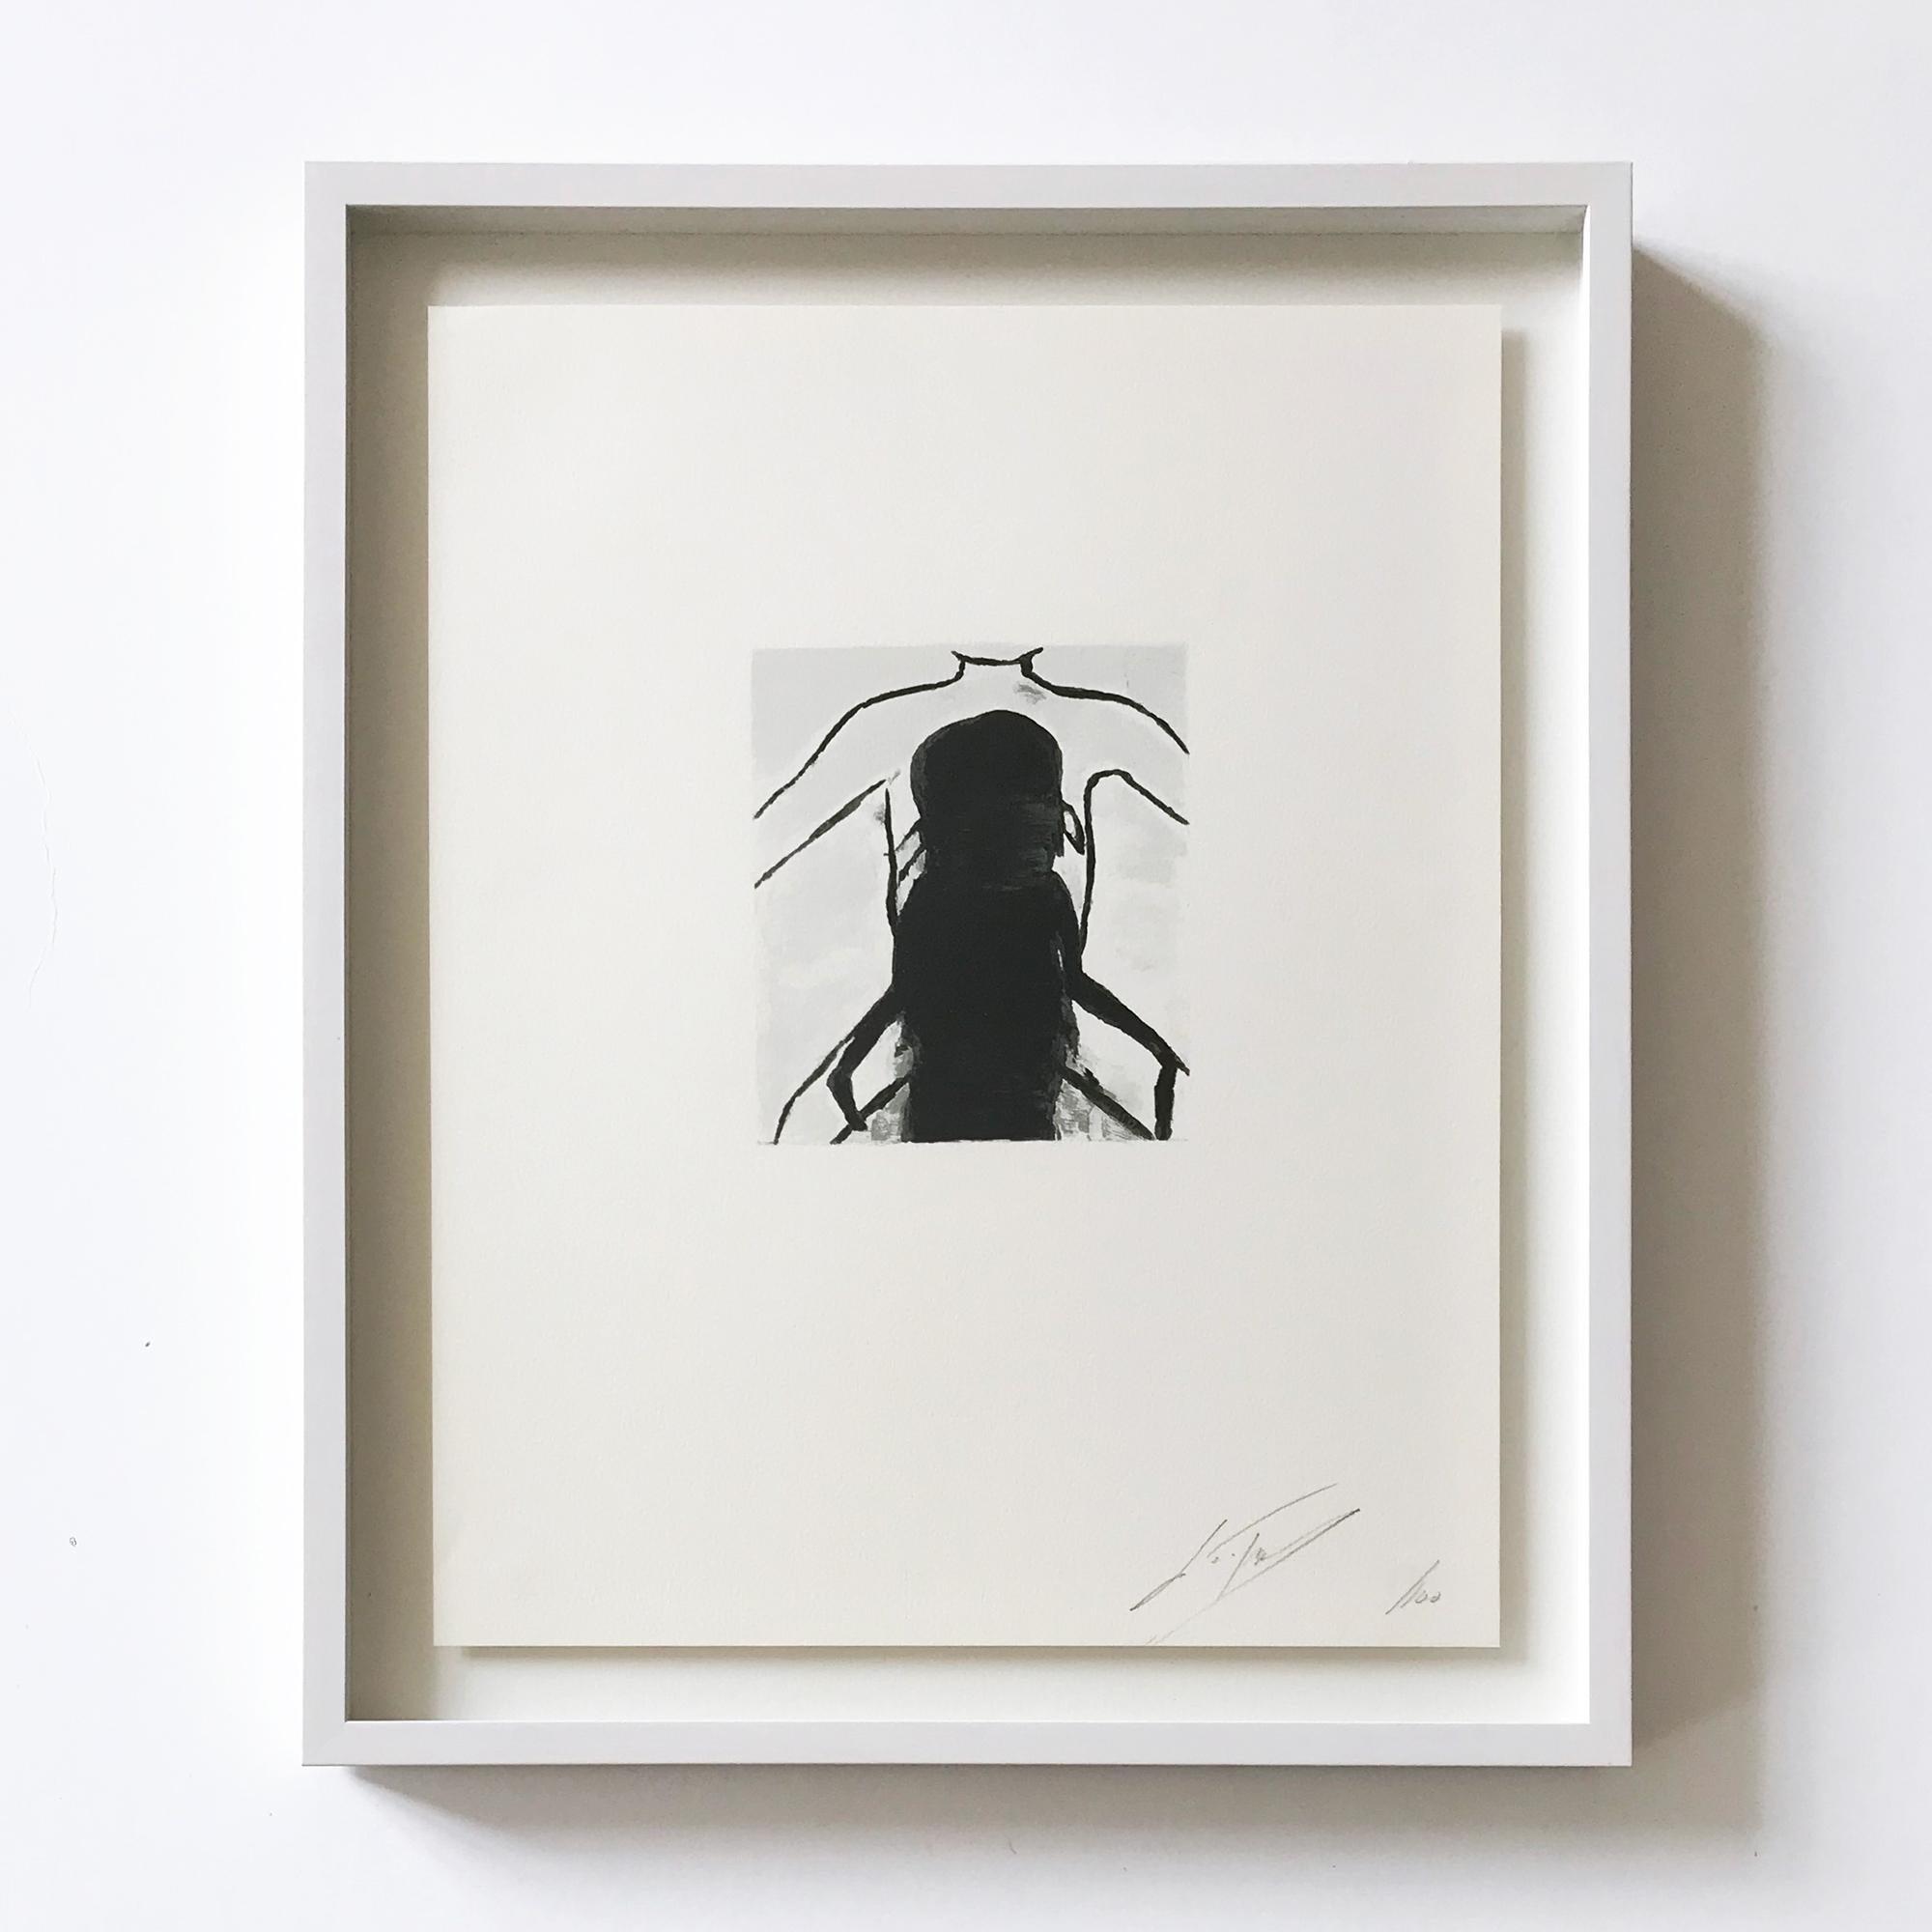 Superstition, Screenprint, Contemporary Art, Belgian Painter, 21st Century